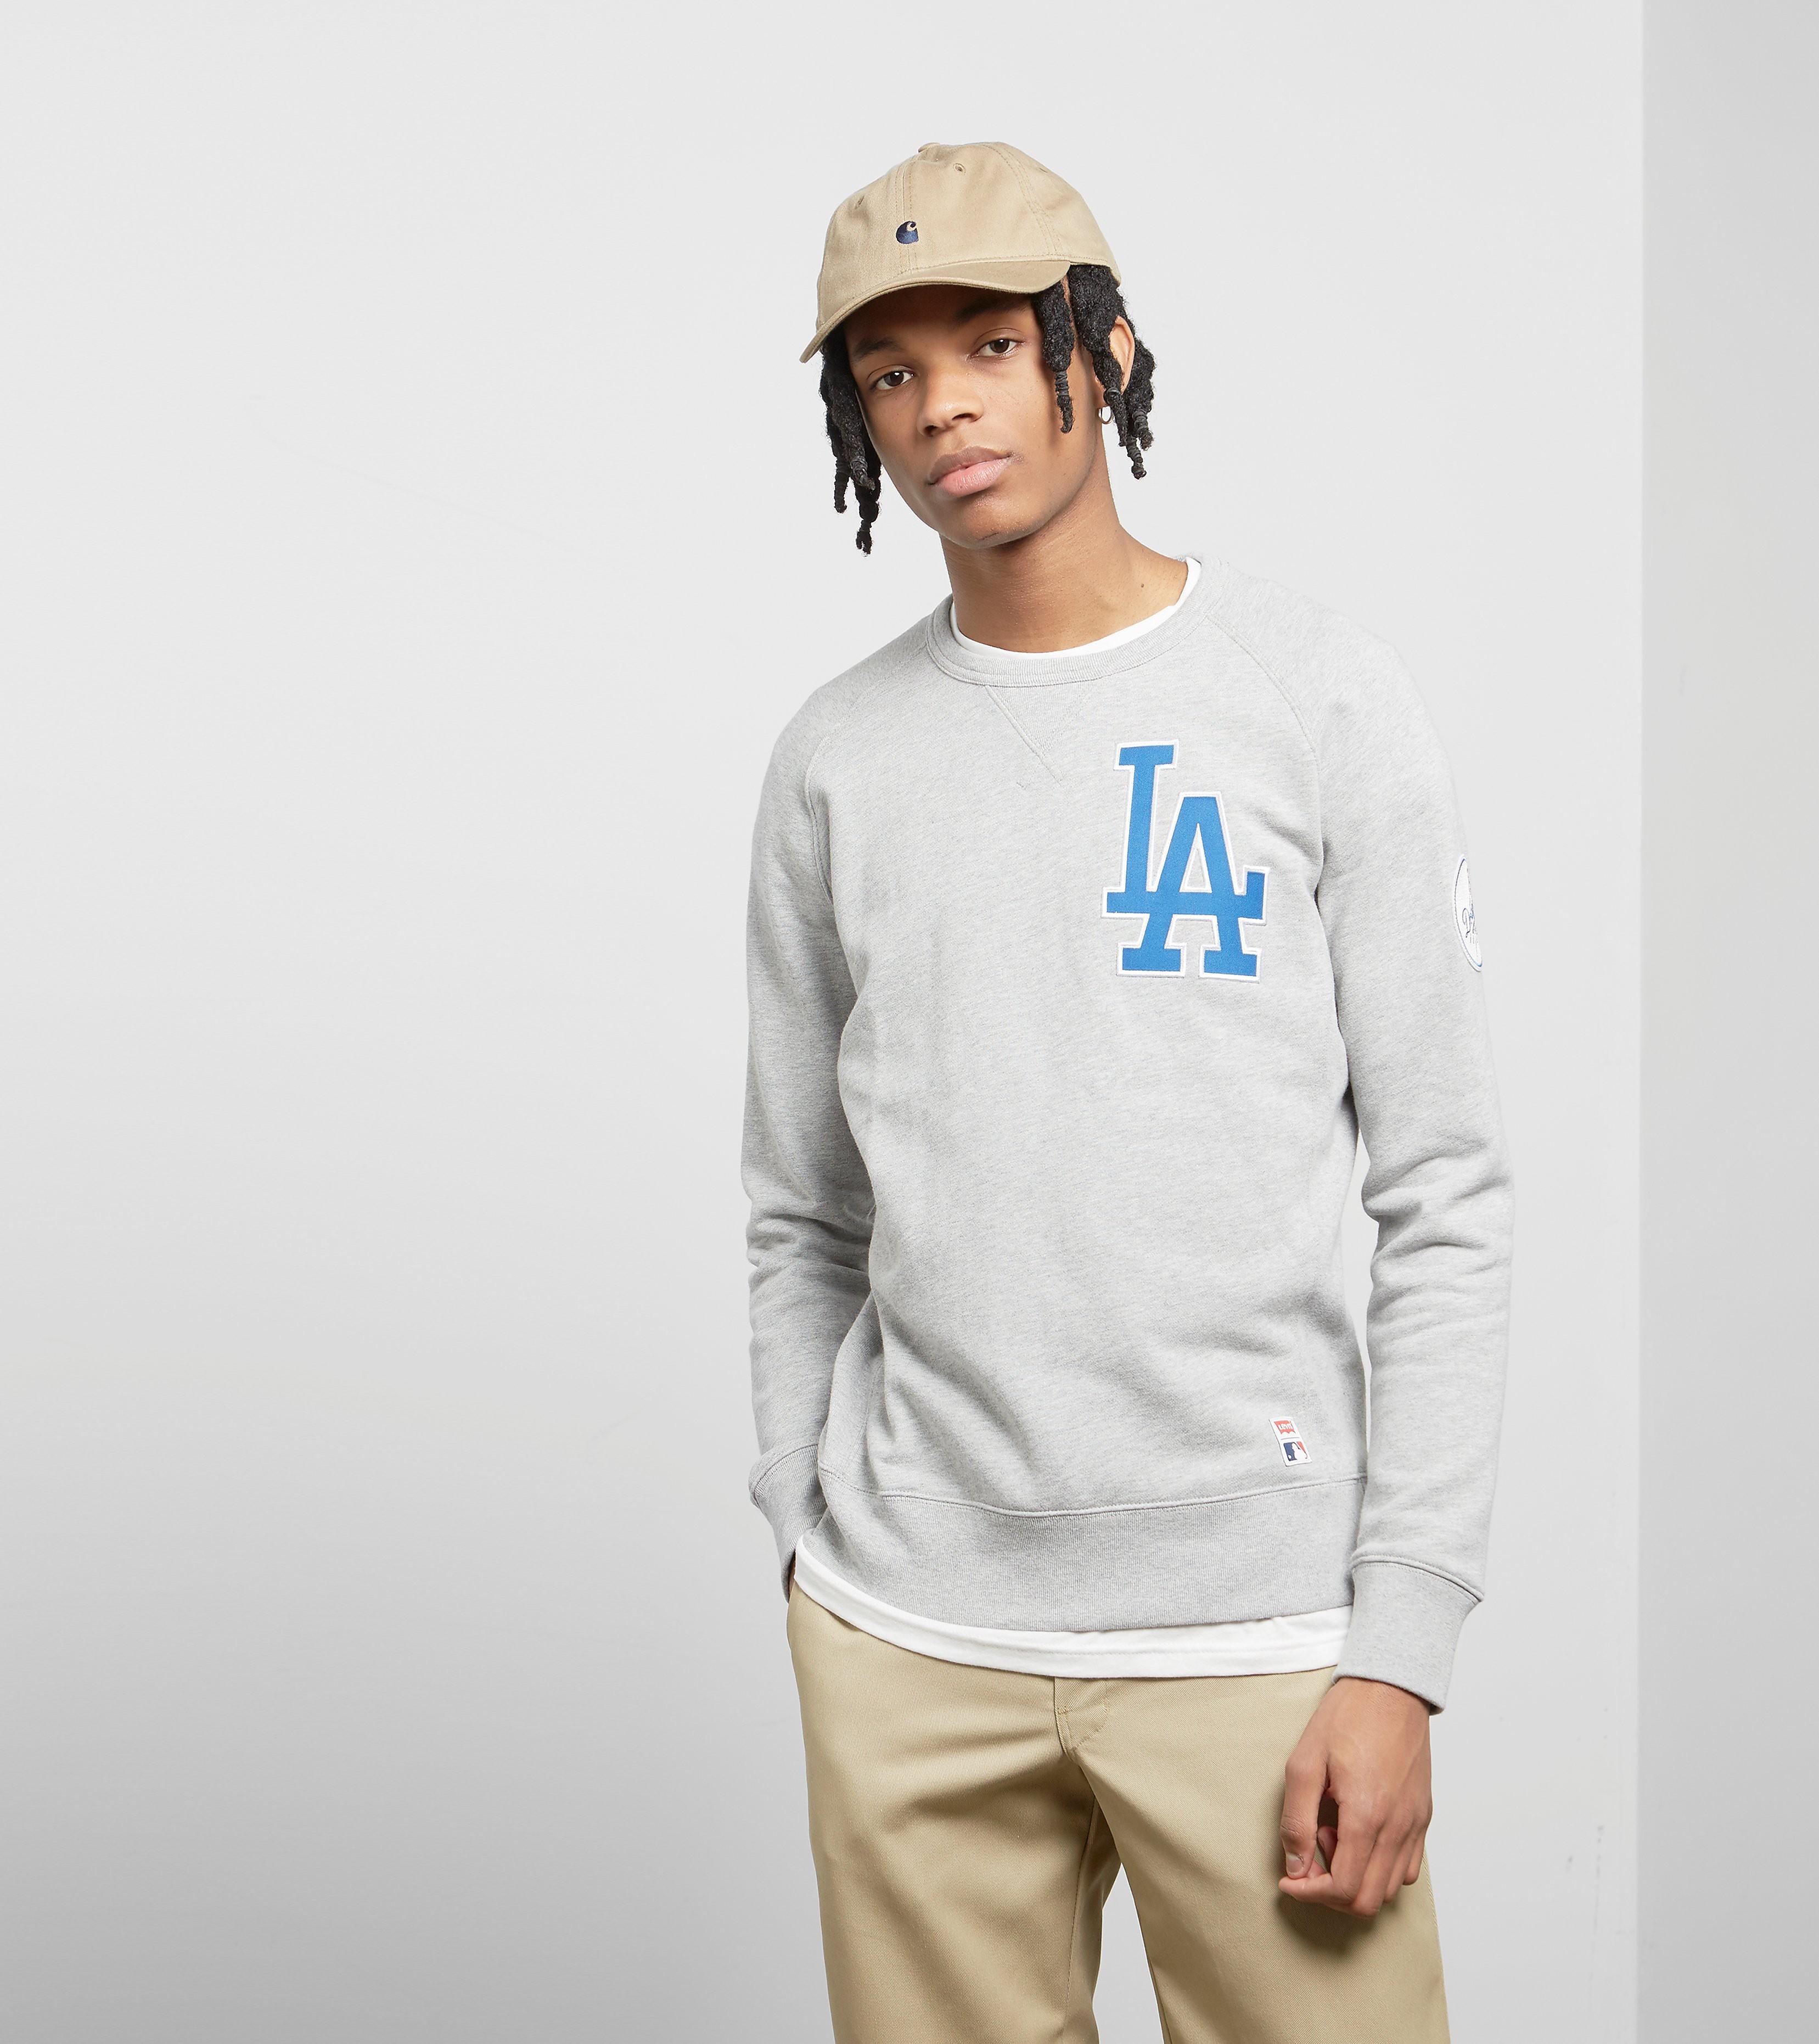 Levis x MLB Los Angeles Dodgers Sweatshirt